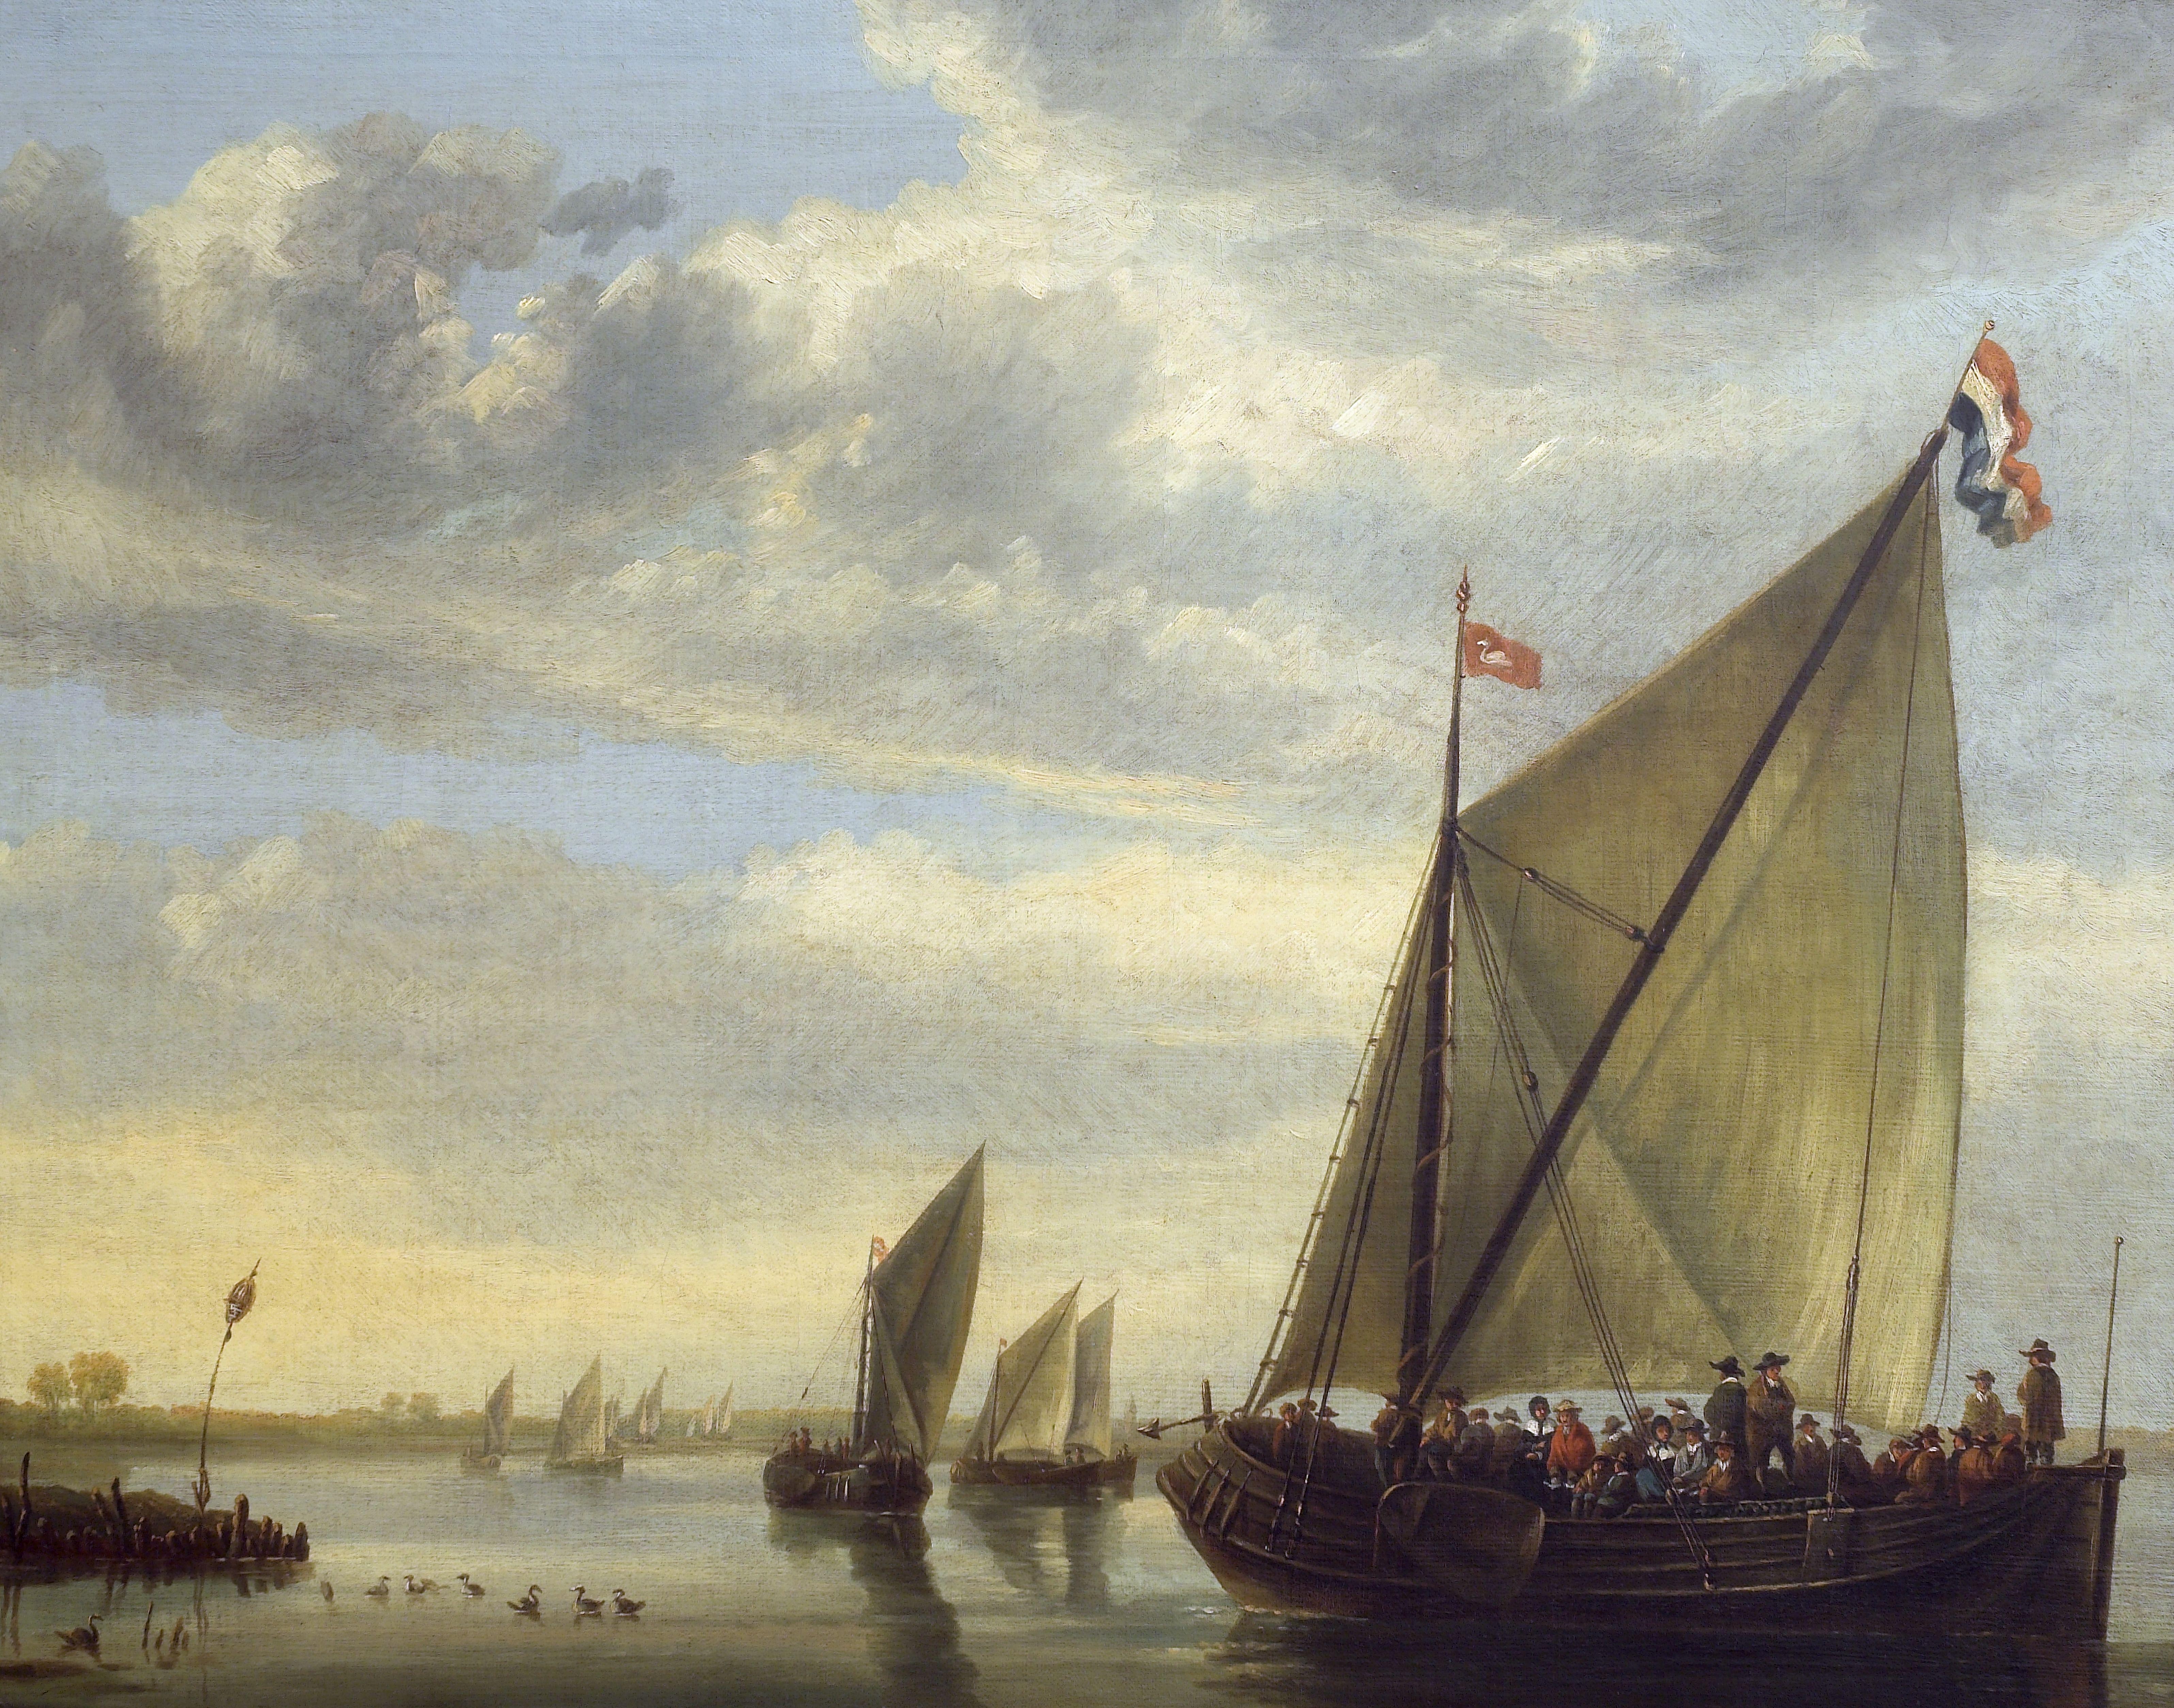 Aelbert Cuyp (1620-1691), <em>River Scene with a Ferry Boat</em>, ca. 1640-1650>br> Auckland Art Gallery Toi o T ̄amaki, Auckland (gift of Sir George Grey, 1887)